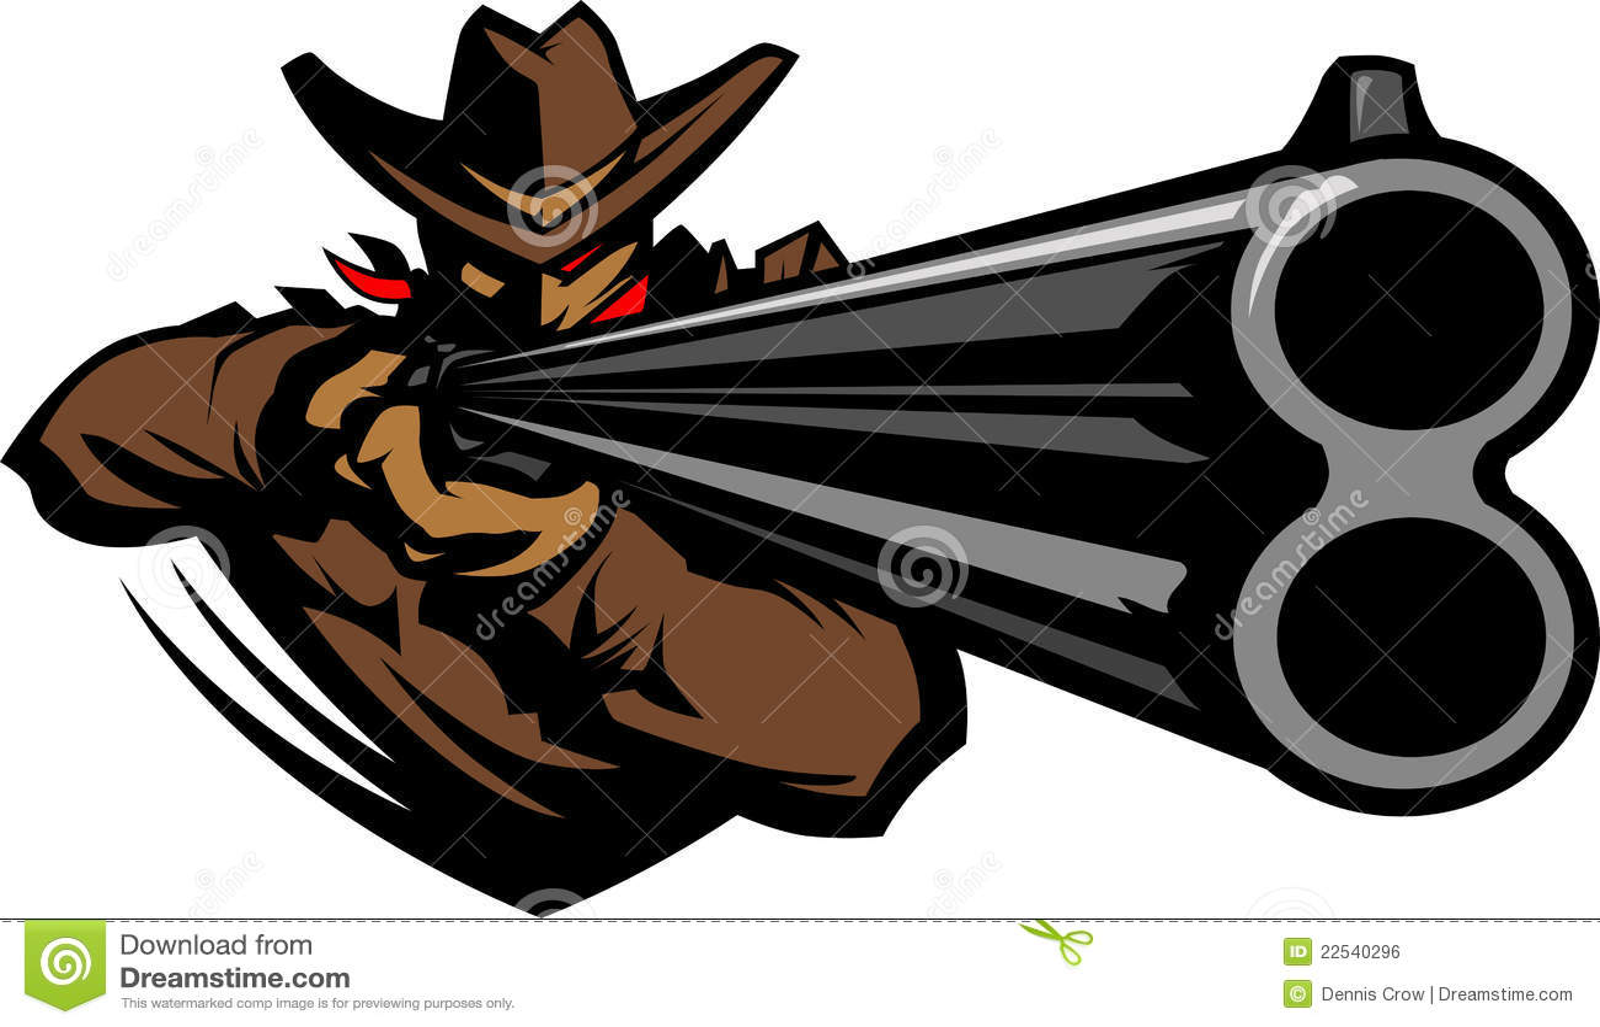 Cowboy mascot aiming shotgun illustration stock vector cowboy mascot aiming shotgun illustration voltagebd Image collections